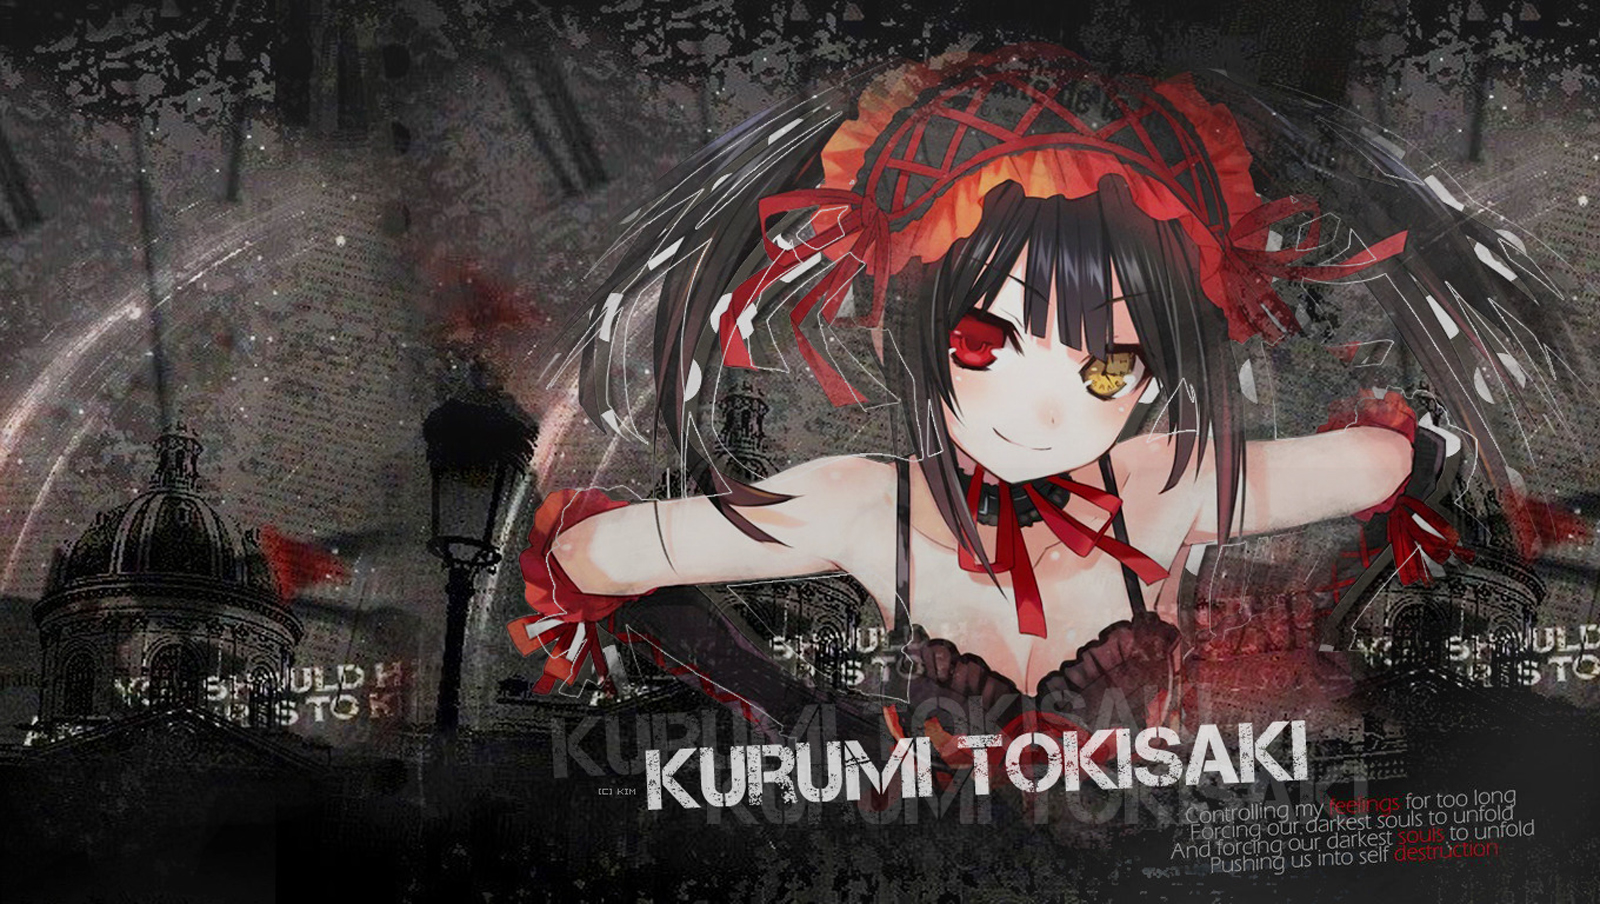 Tokisaki Kurumi Date A Live Anime HD Wallpaper Desktop PC Background 1600x904